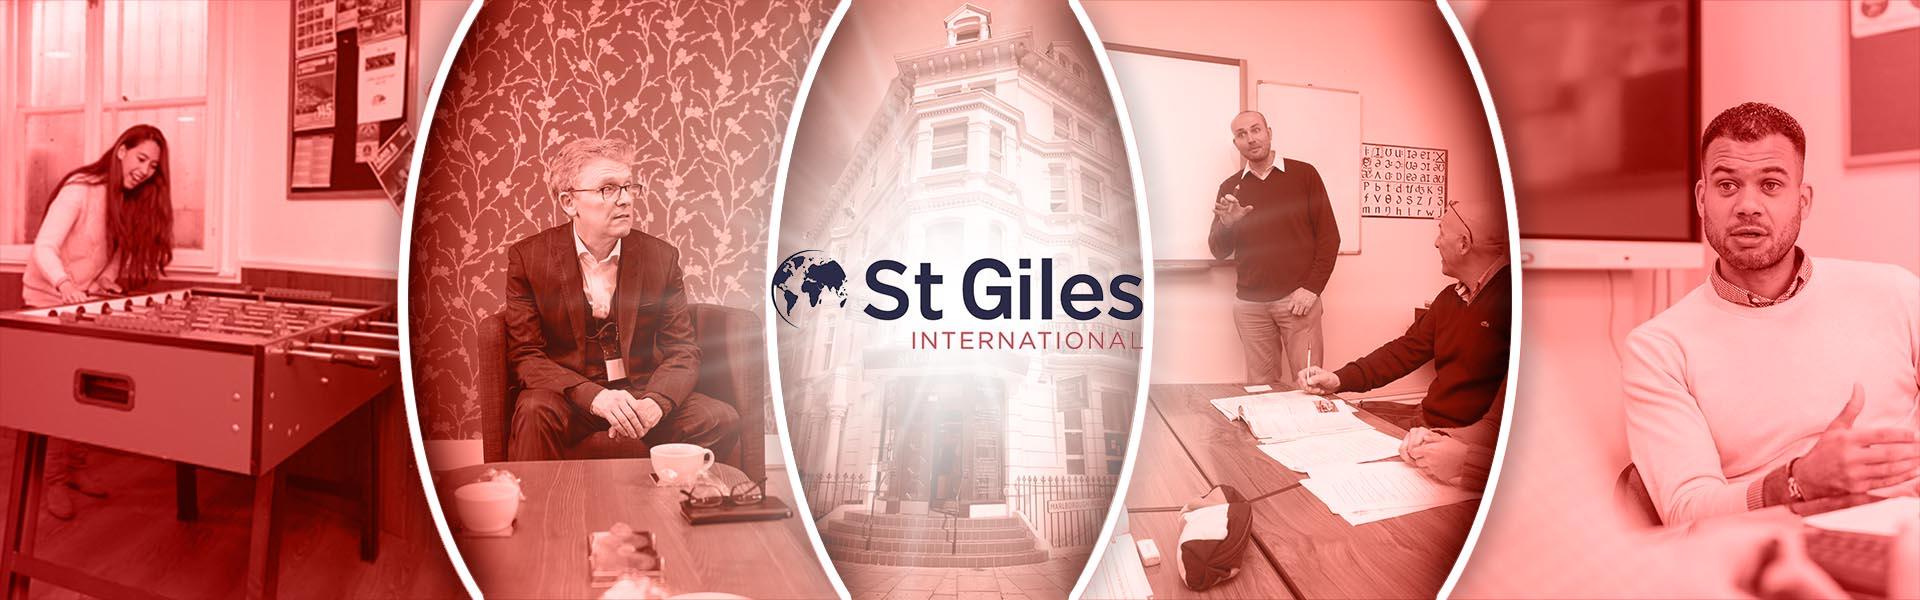 St Giles Brighton Dil Okulu